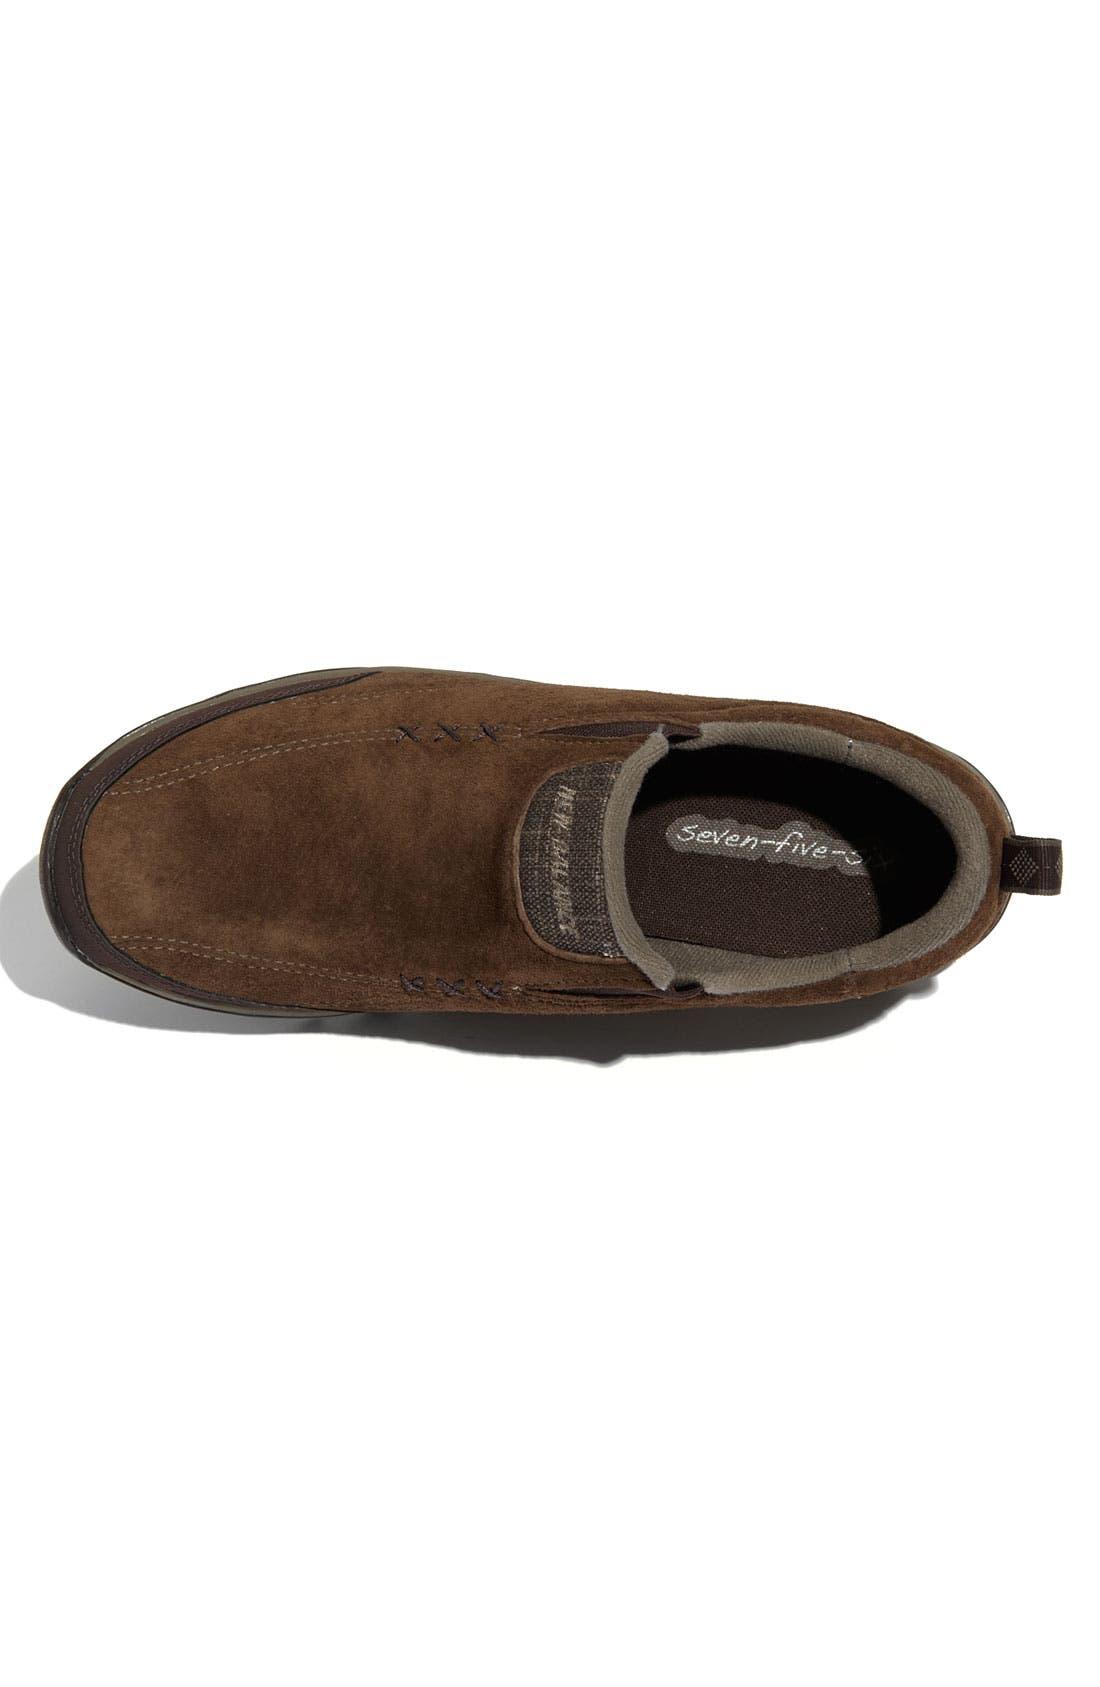 Alternate Image 3  - New Balance '756' Walking Shoe (Men) (Online Only)